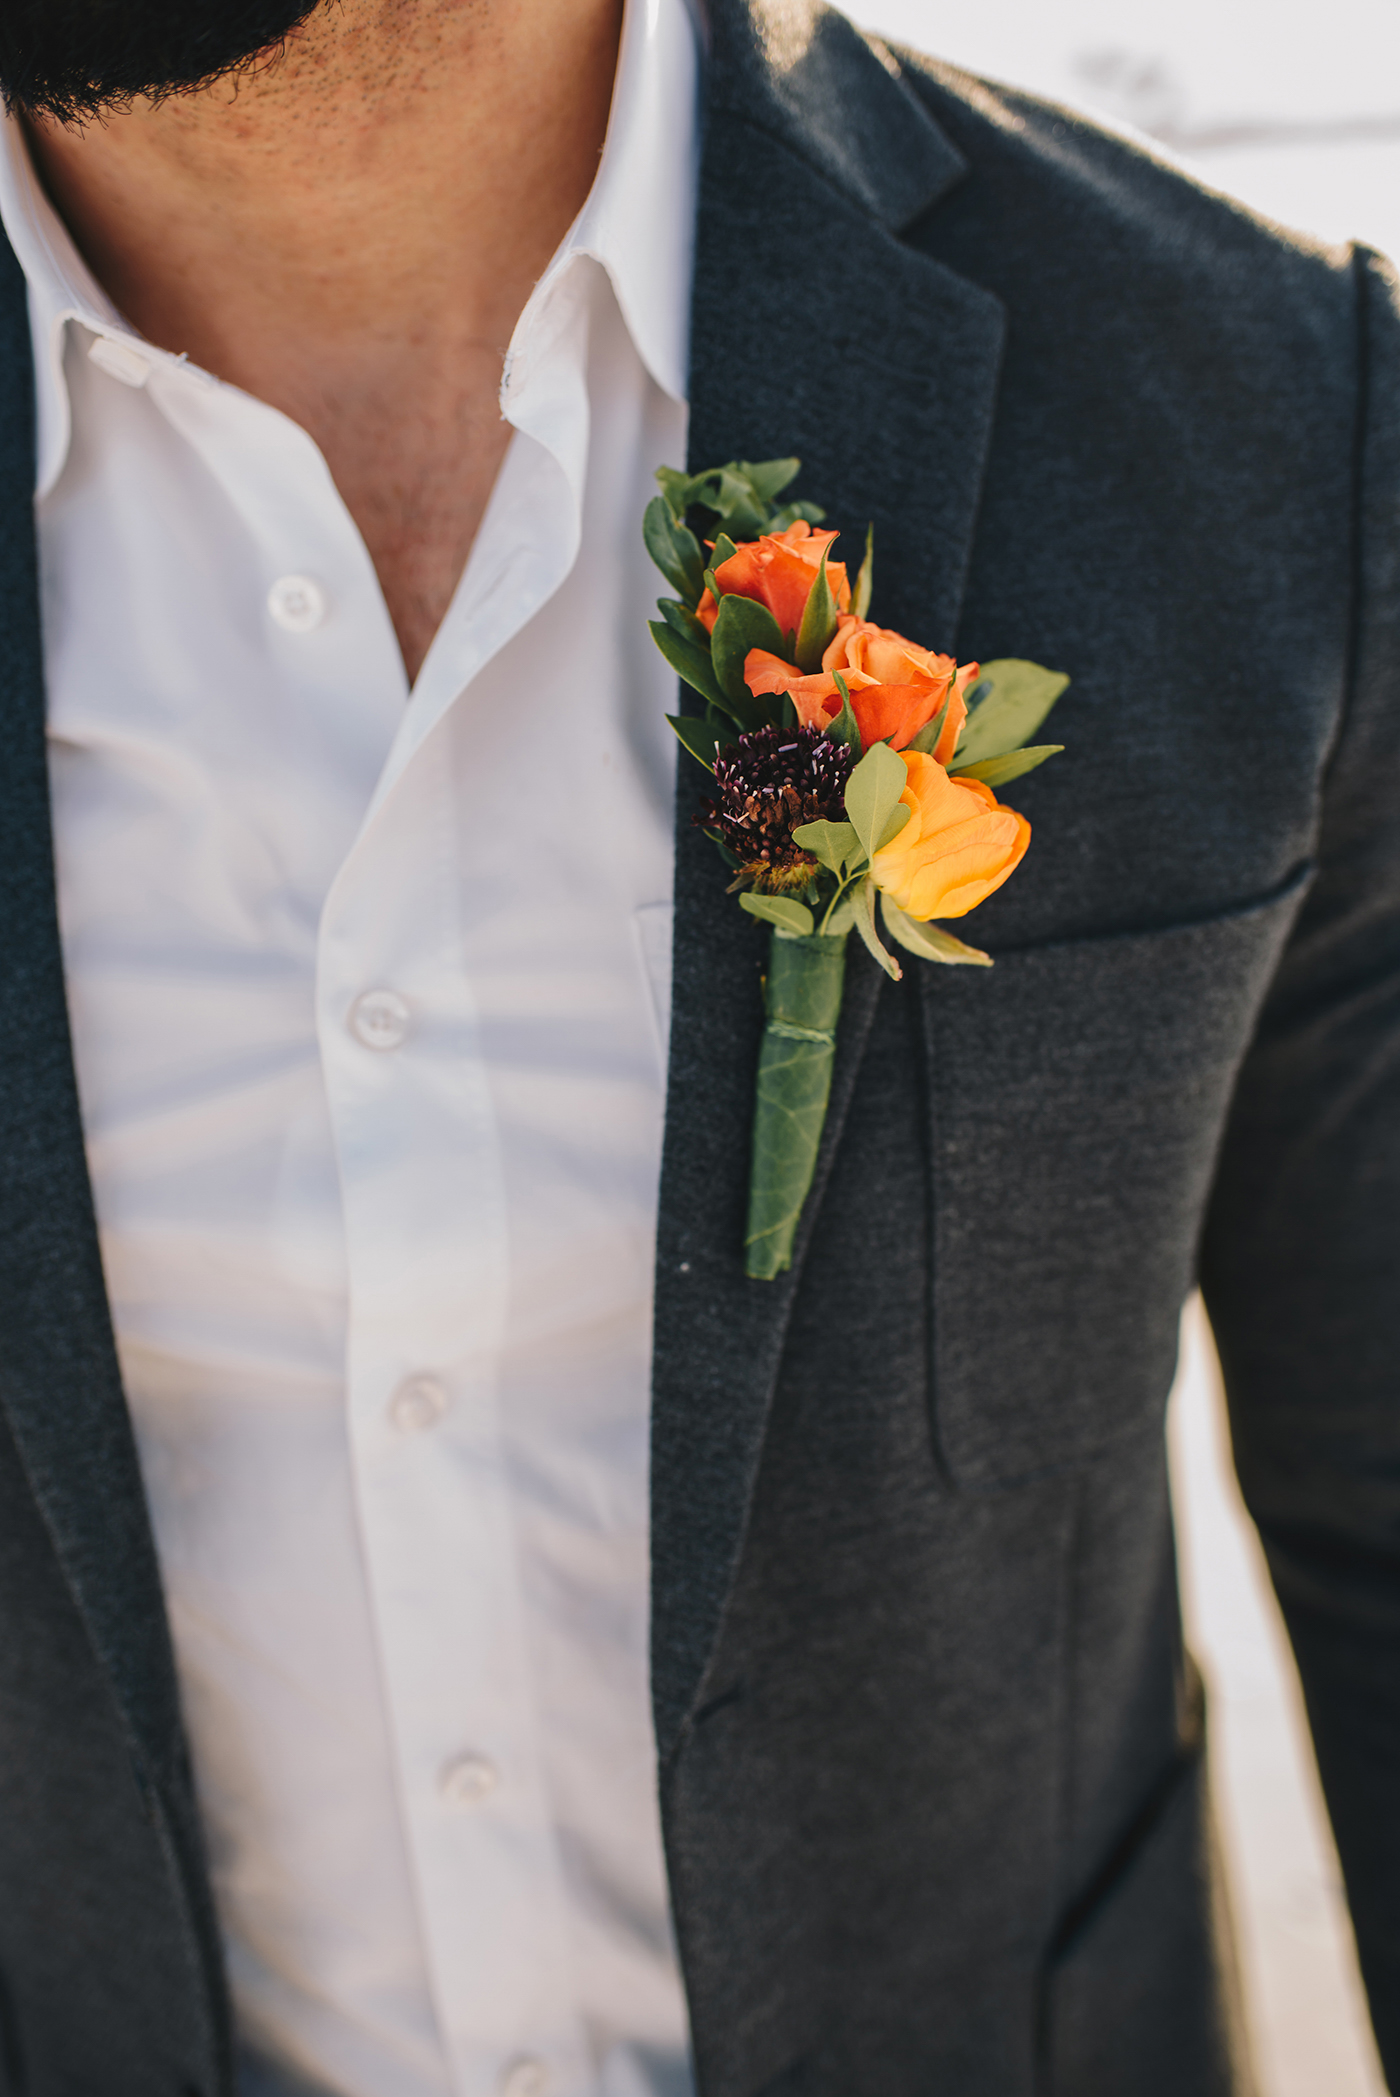 Los-Vargas-Photo-Moana-Wedding-Style-shoot-37.jpg